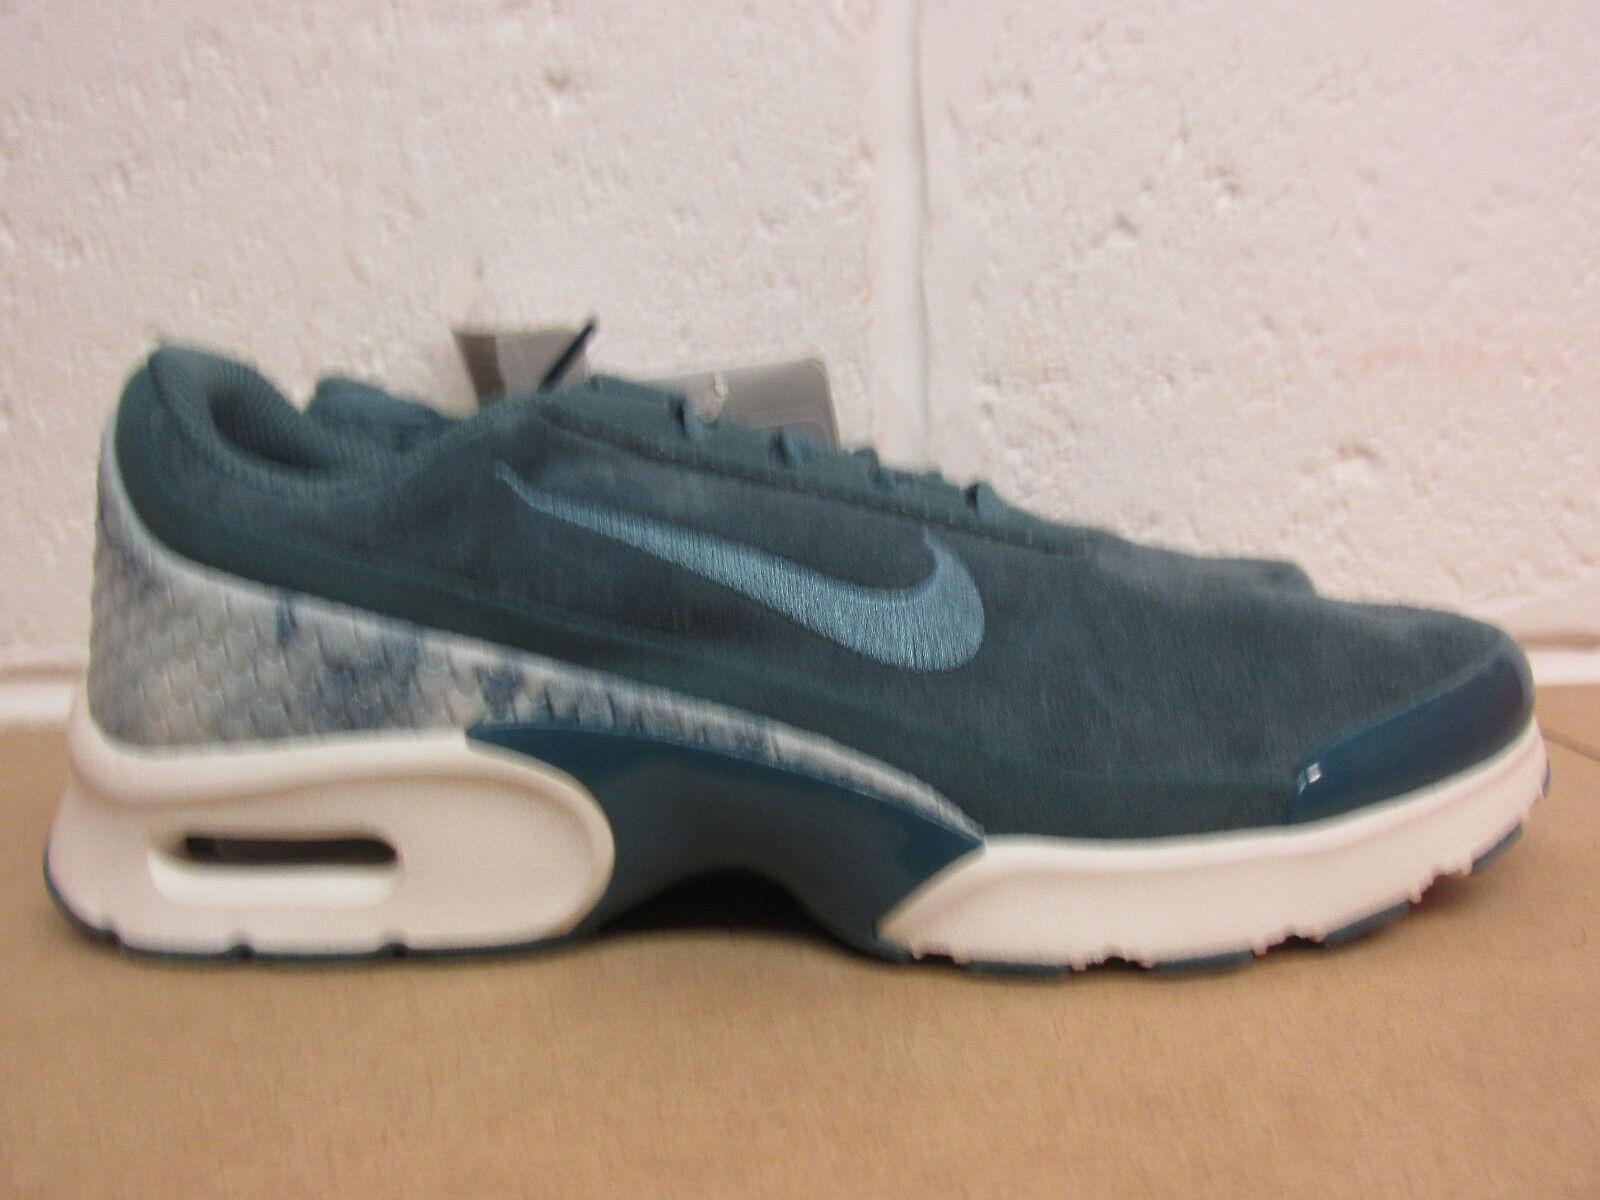 5da512448d8 ... Nike air max jewell 917672 300 womens trainers sneakers sneakers  sneakers shoes SAMPLE 0e447c ...